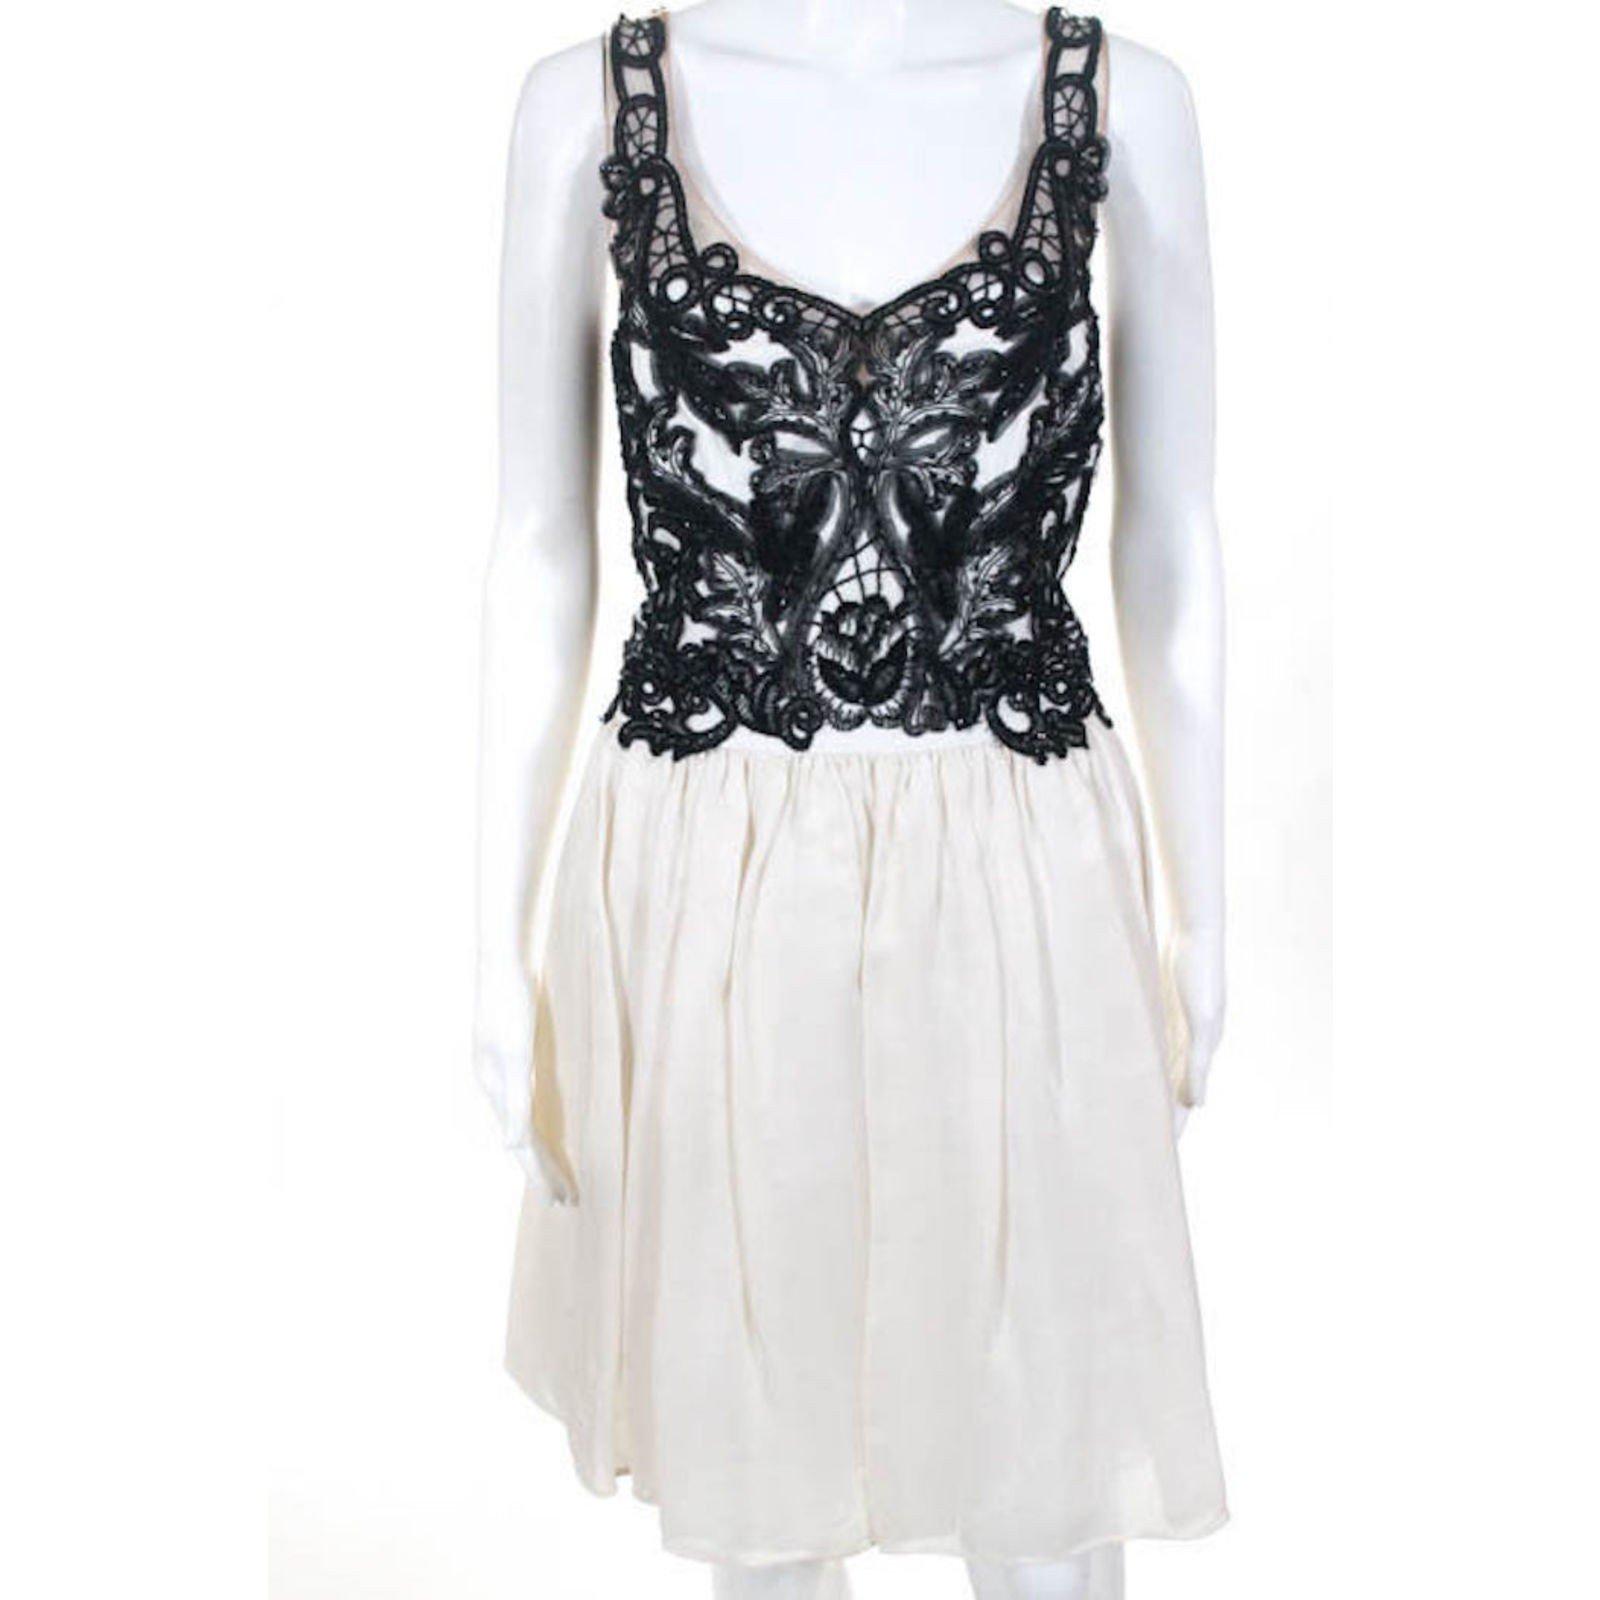 67504386f1ed Marchesa Marchesa Notte Gazaar silk dress Dresses Silk Black,White ...